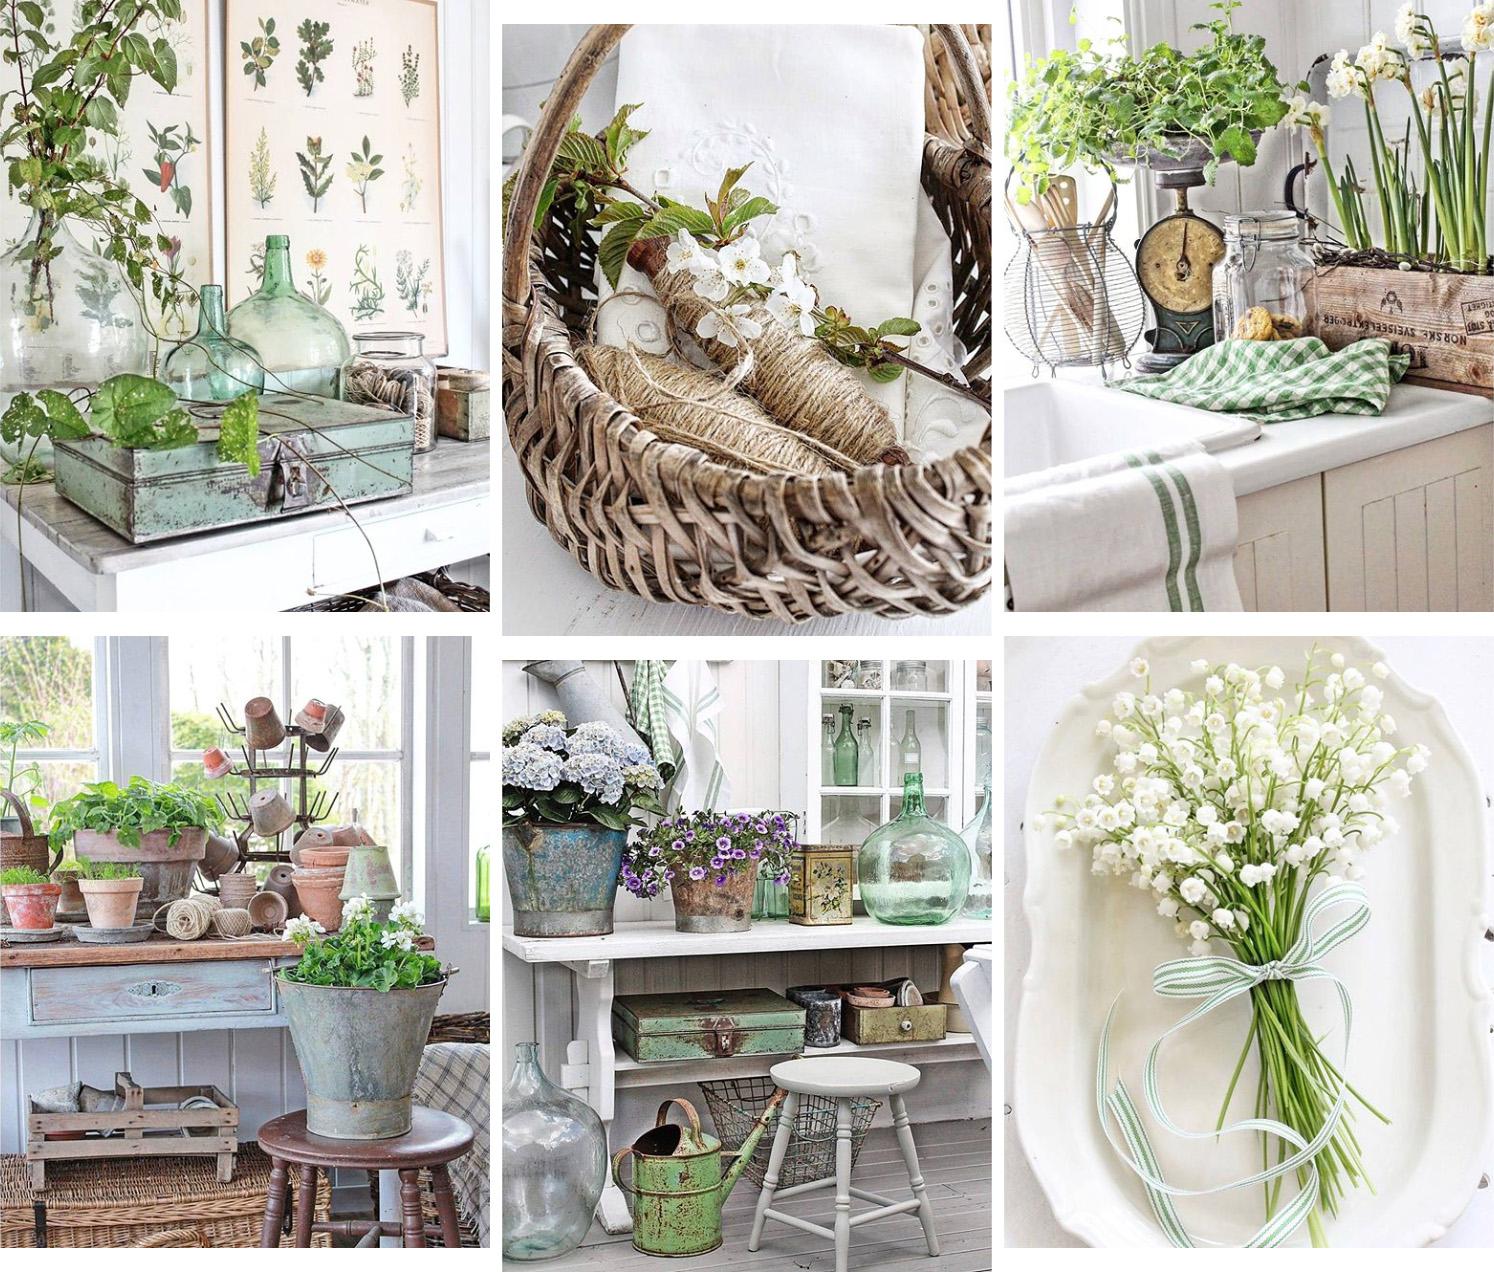 A primavera rinasce il mio animo green shabby chic interiors - Shabby chic giardino ...